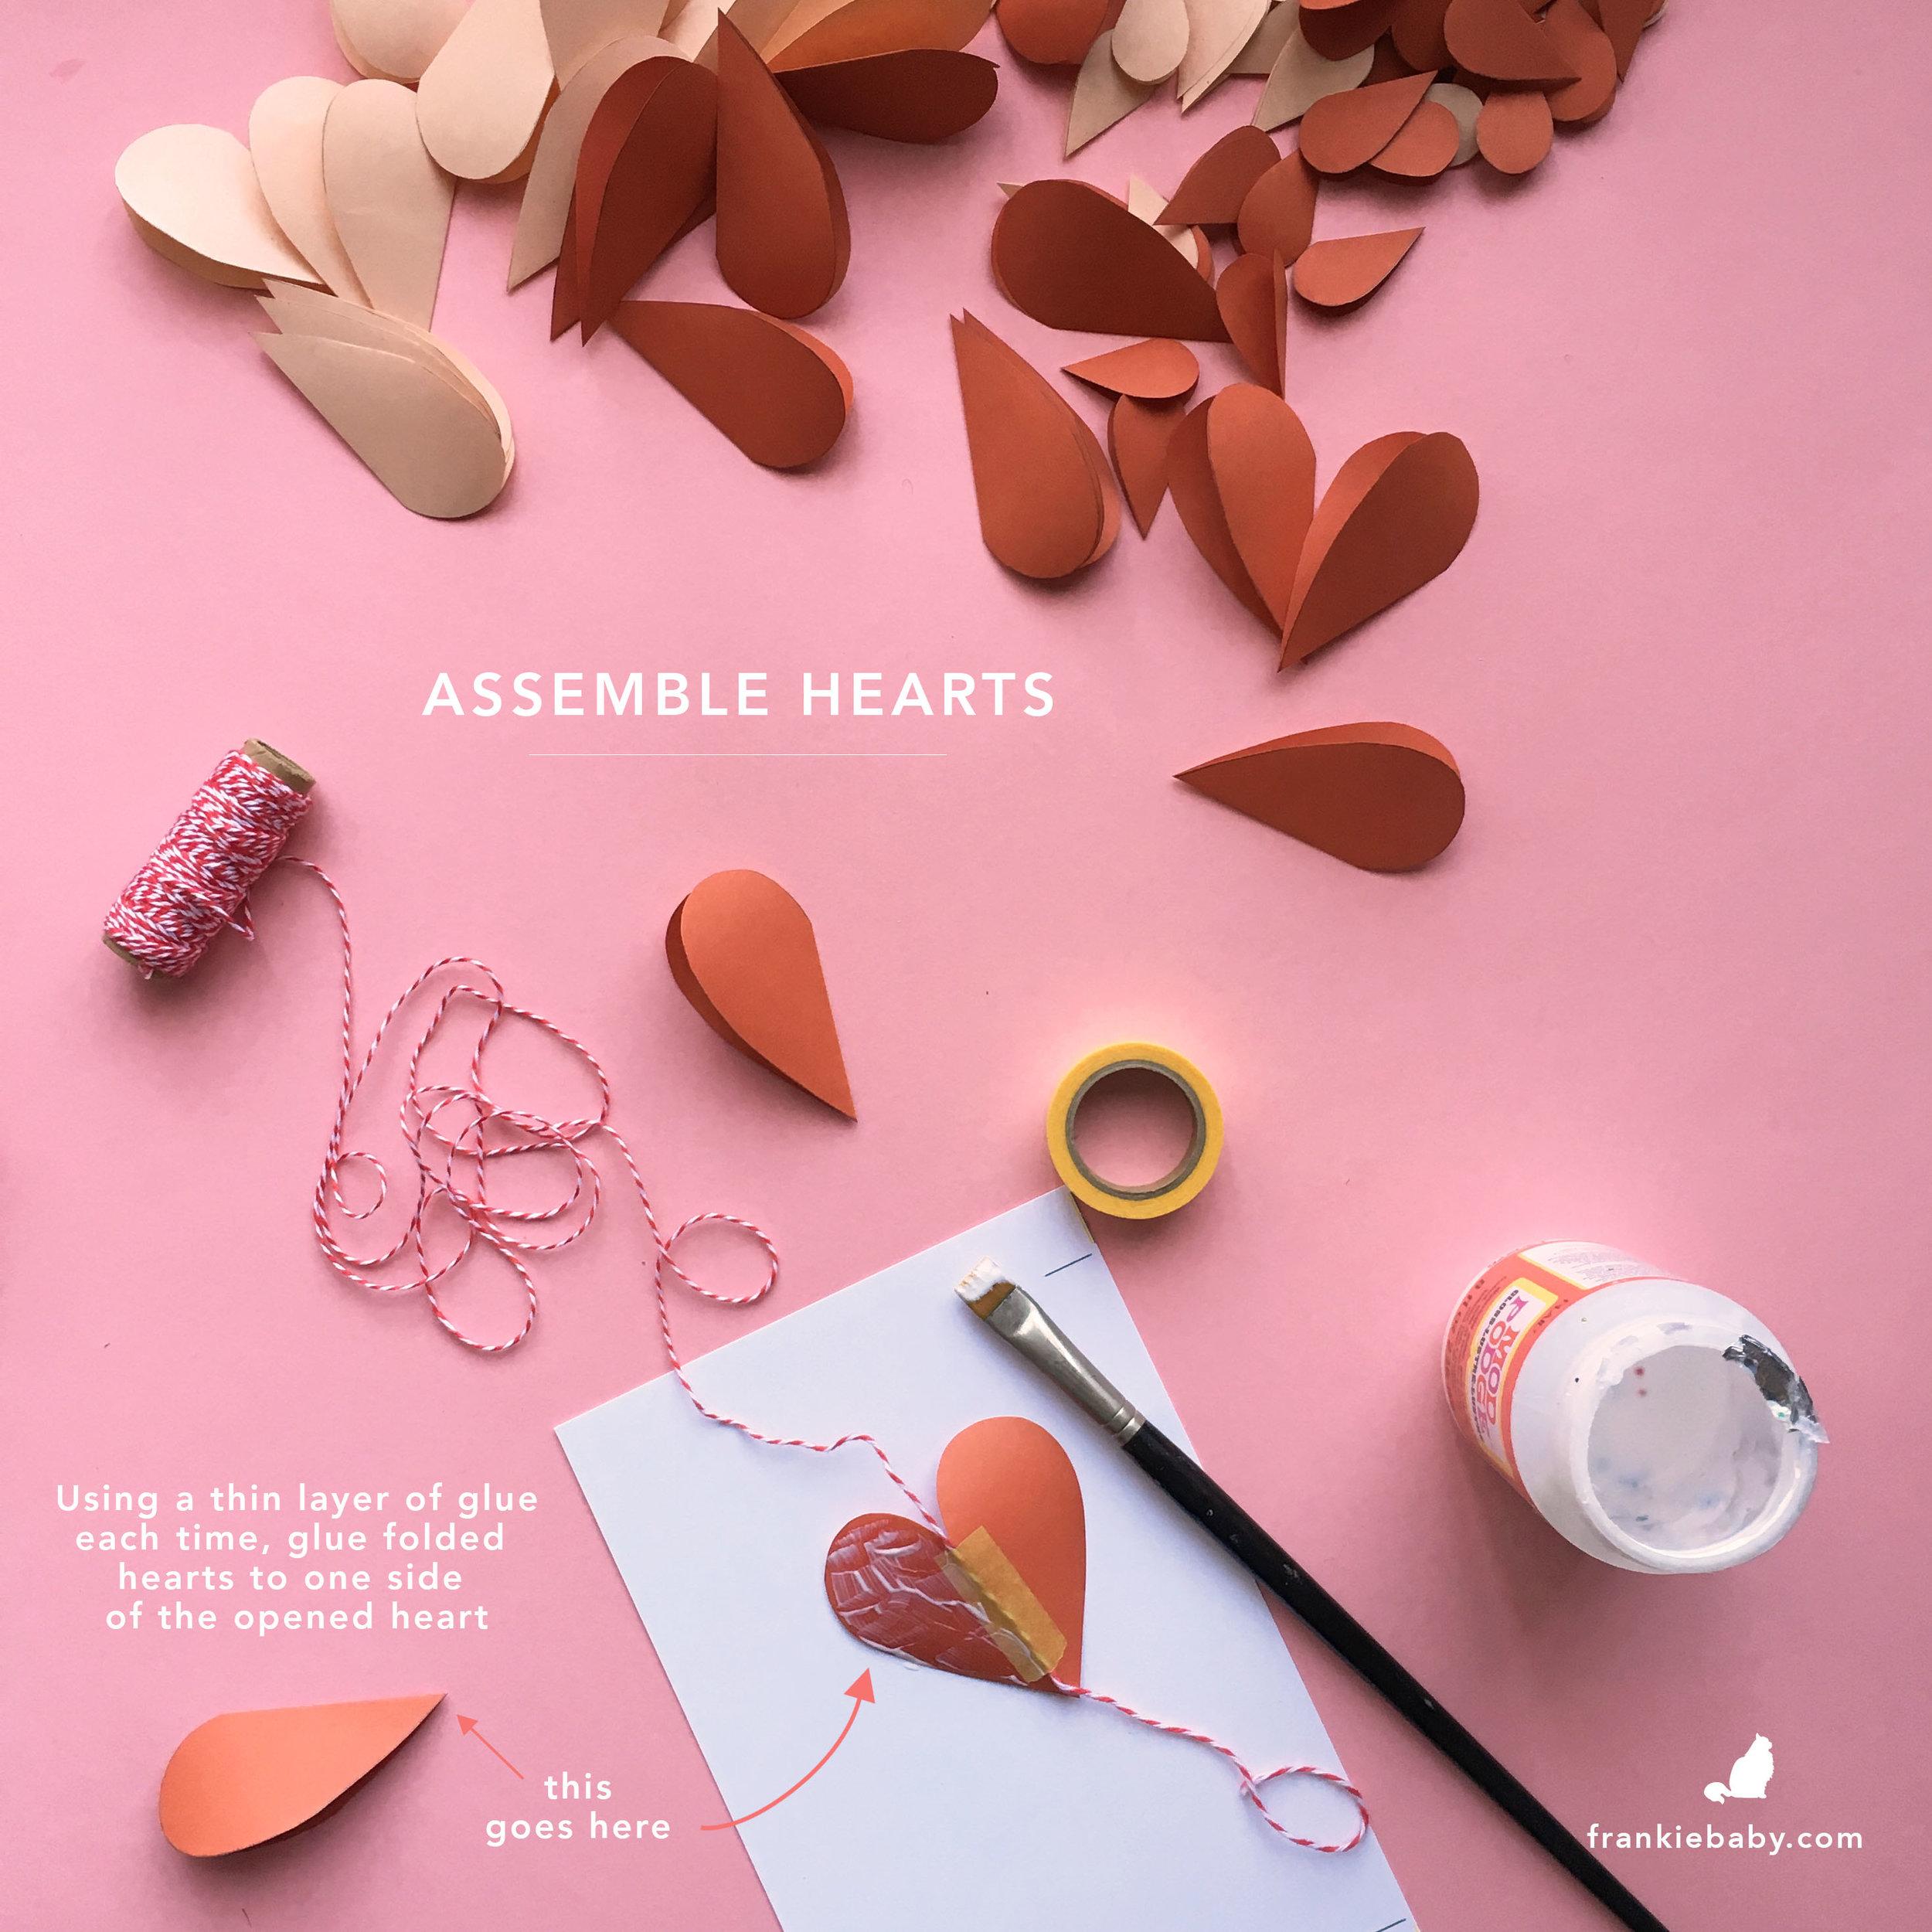 5_frankie_baby_heart_garland_diy_assemble hearts.jpg